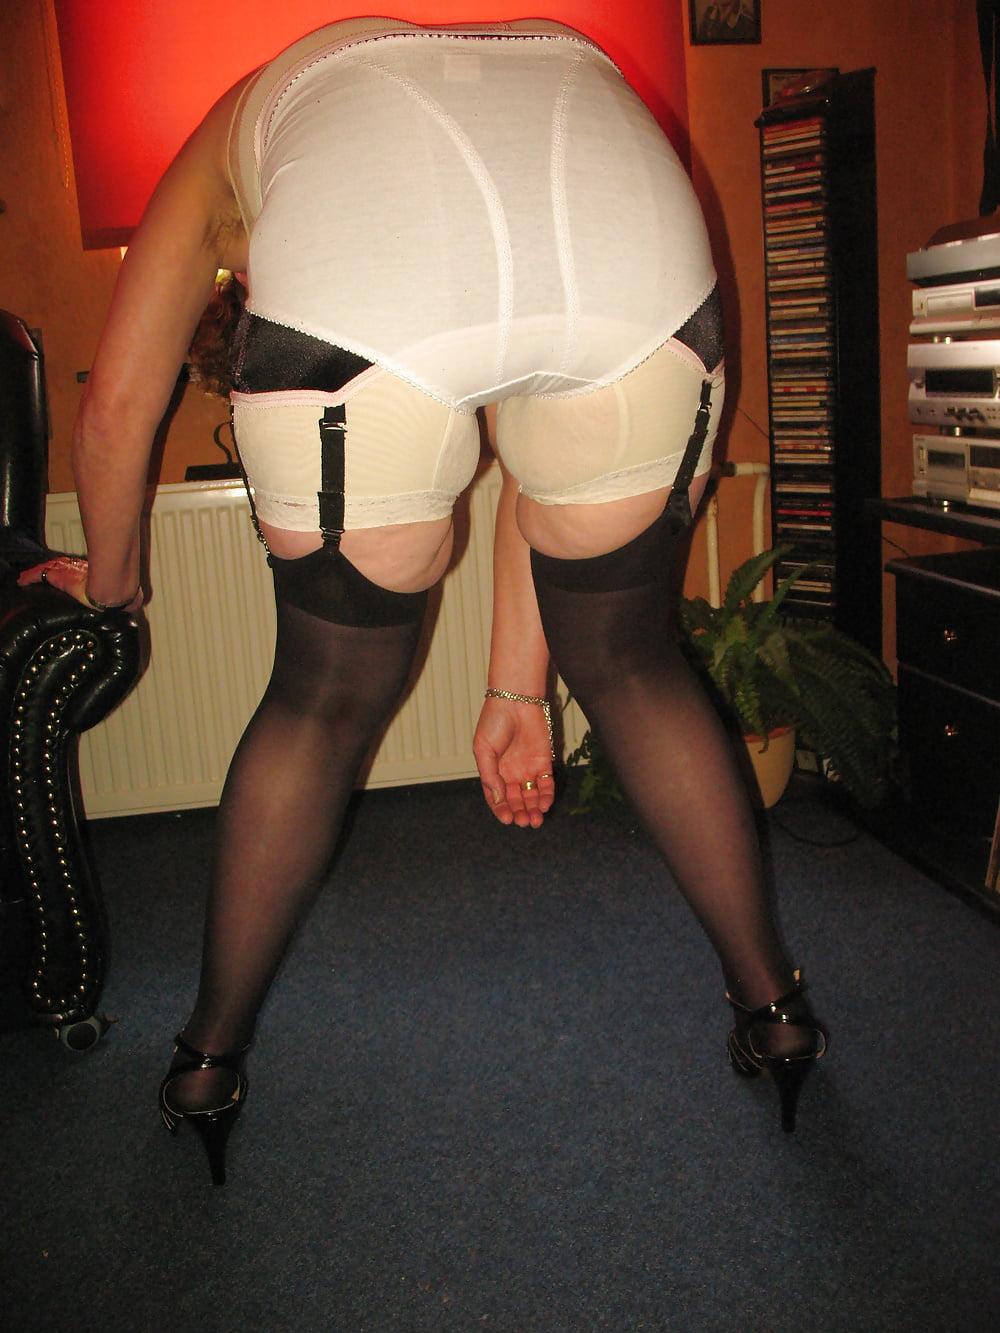 bra-girdle-pantyhose-porn-thumbs-tights